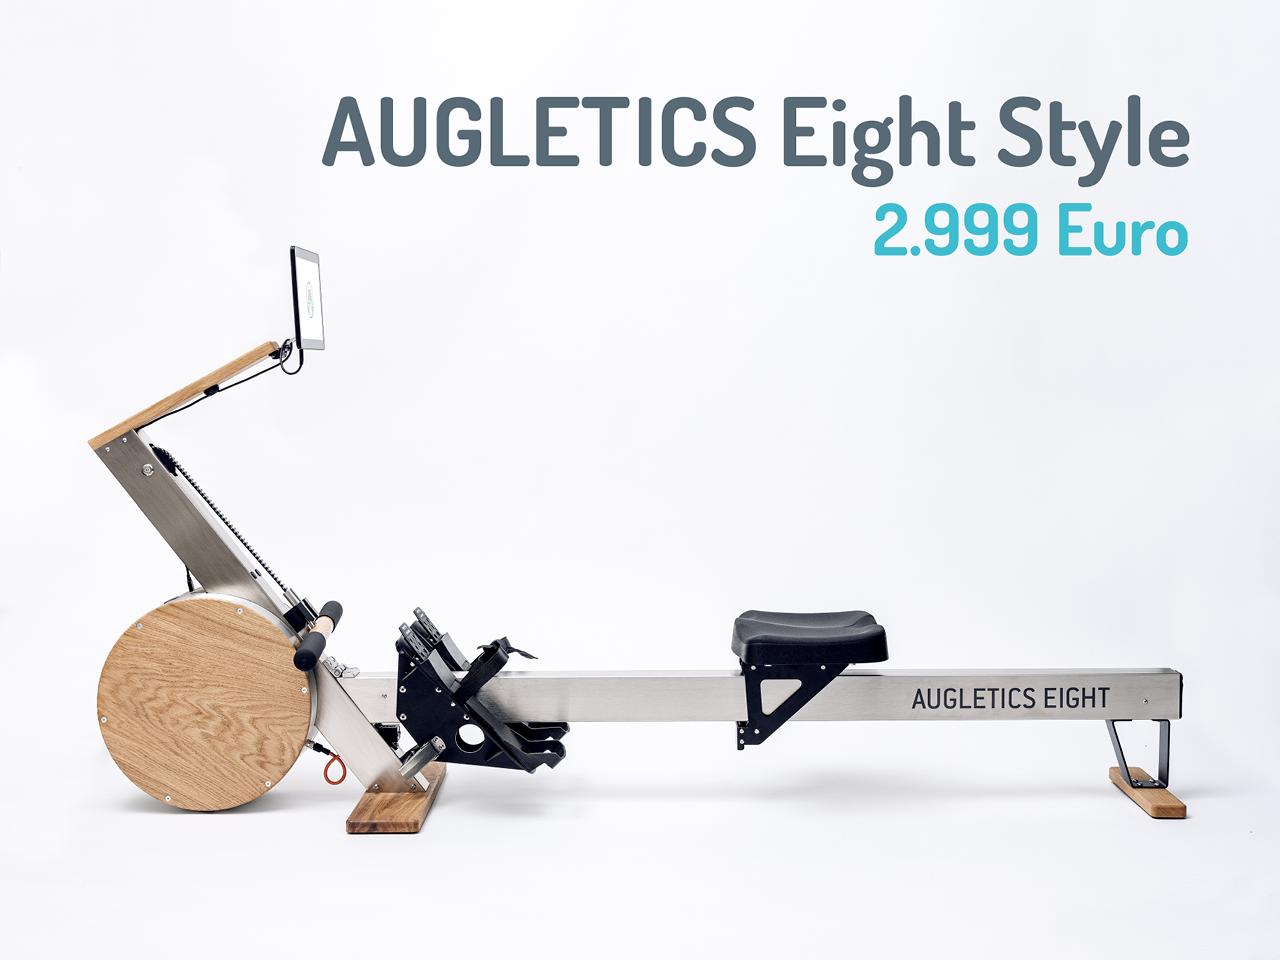 Augletics Eight Style Preis 2021 2999